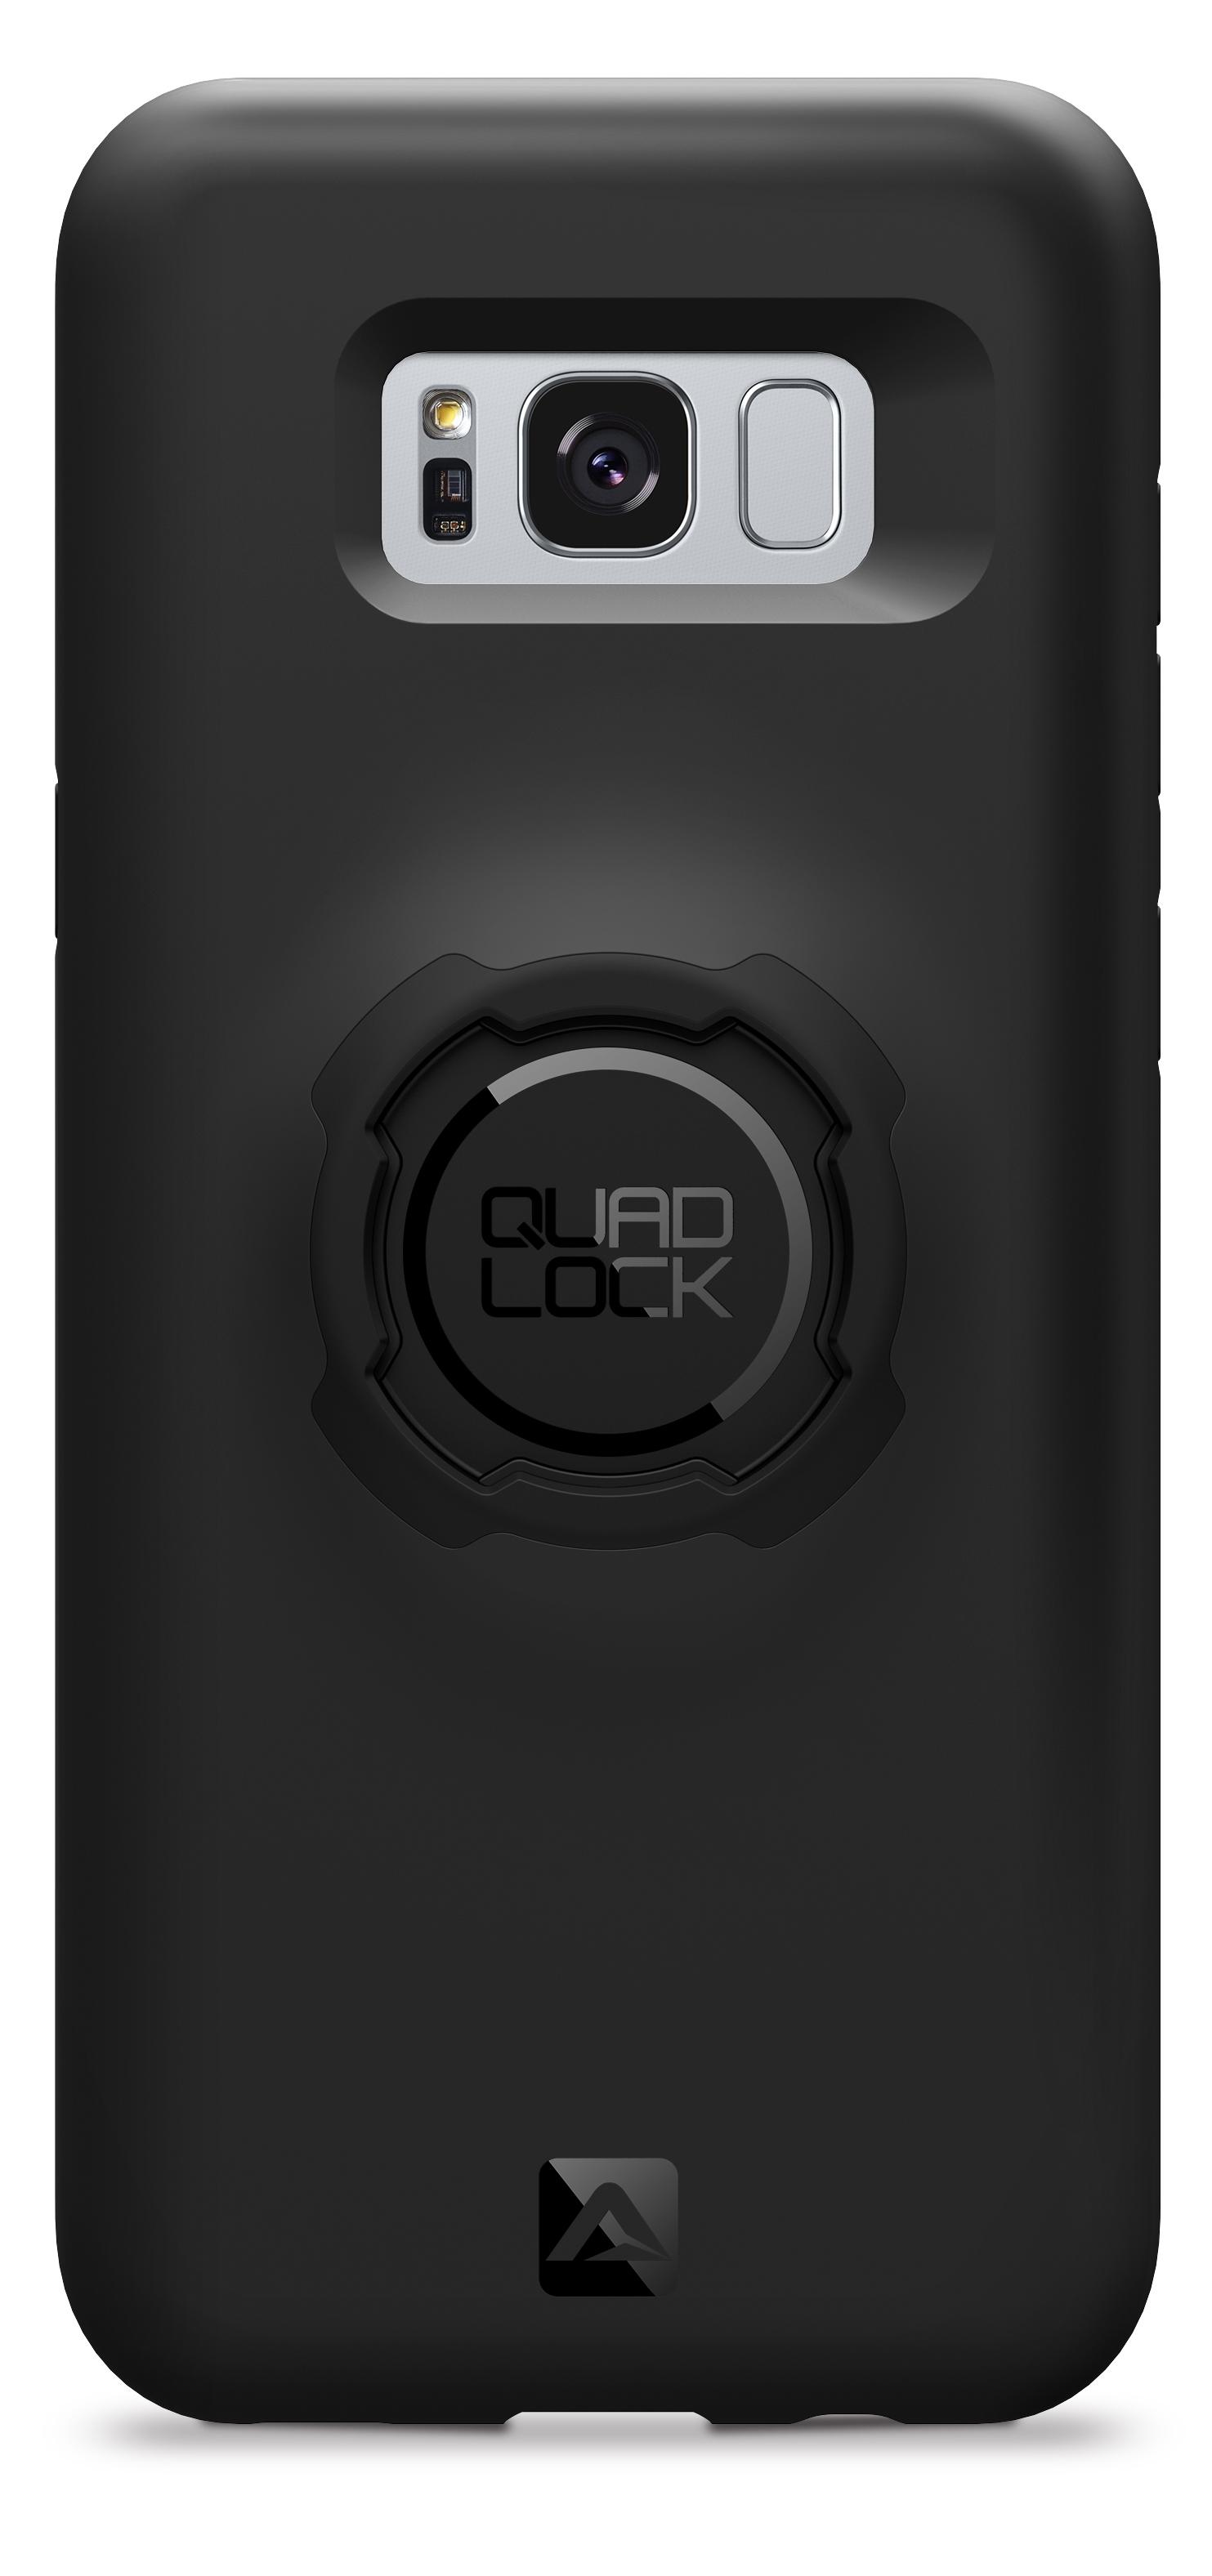 Quad Lock - Cover - Til Samsung S7 Edge | Travel bags